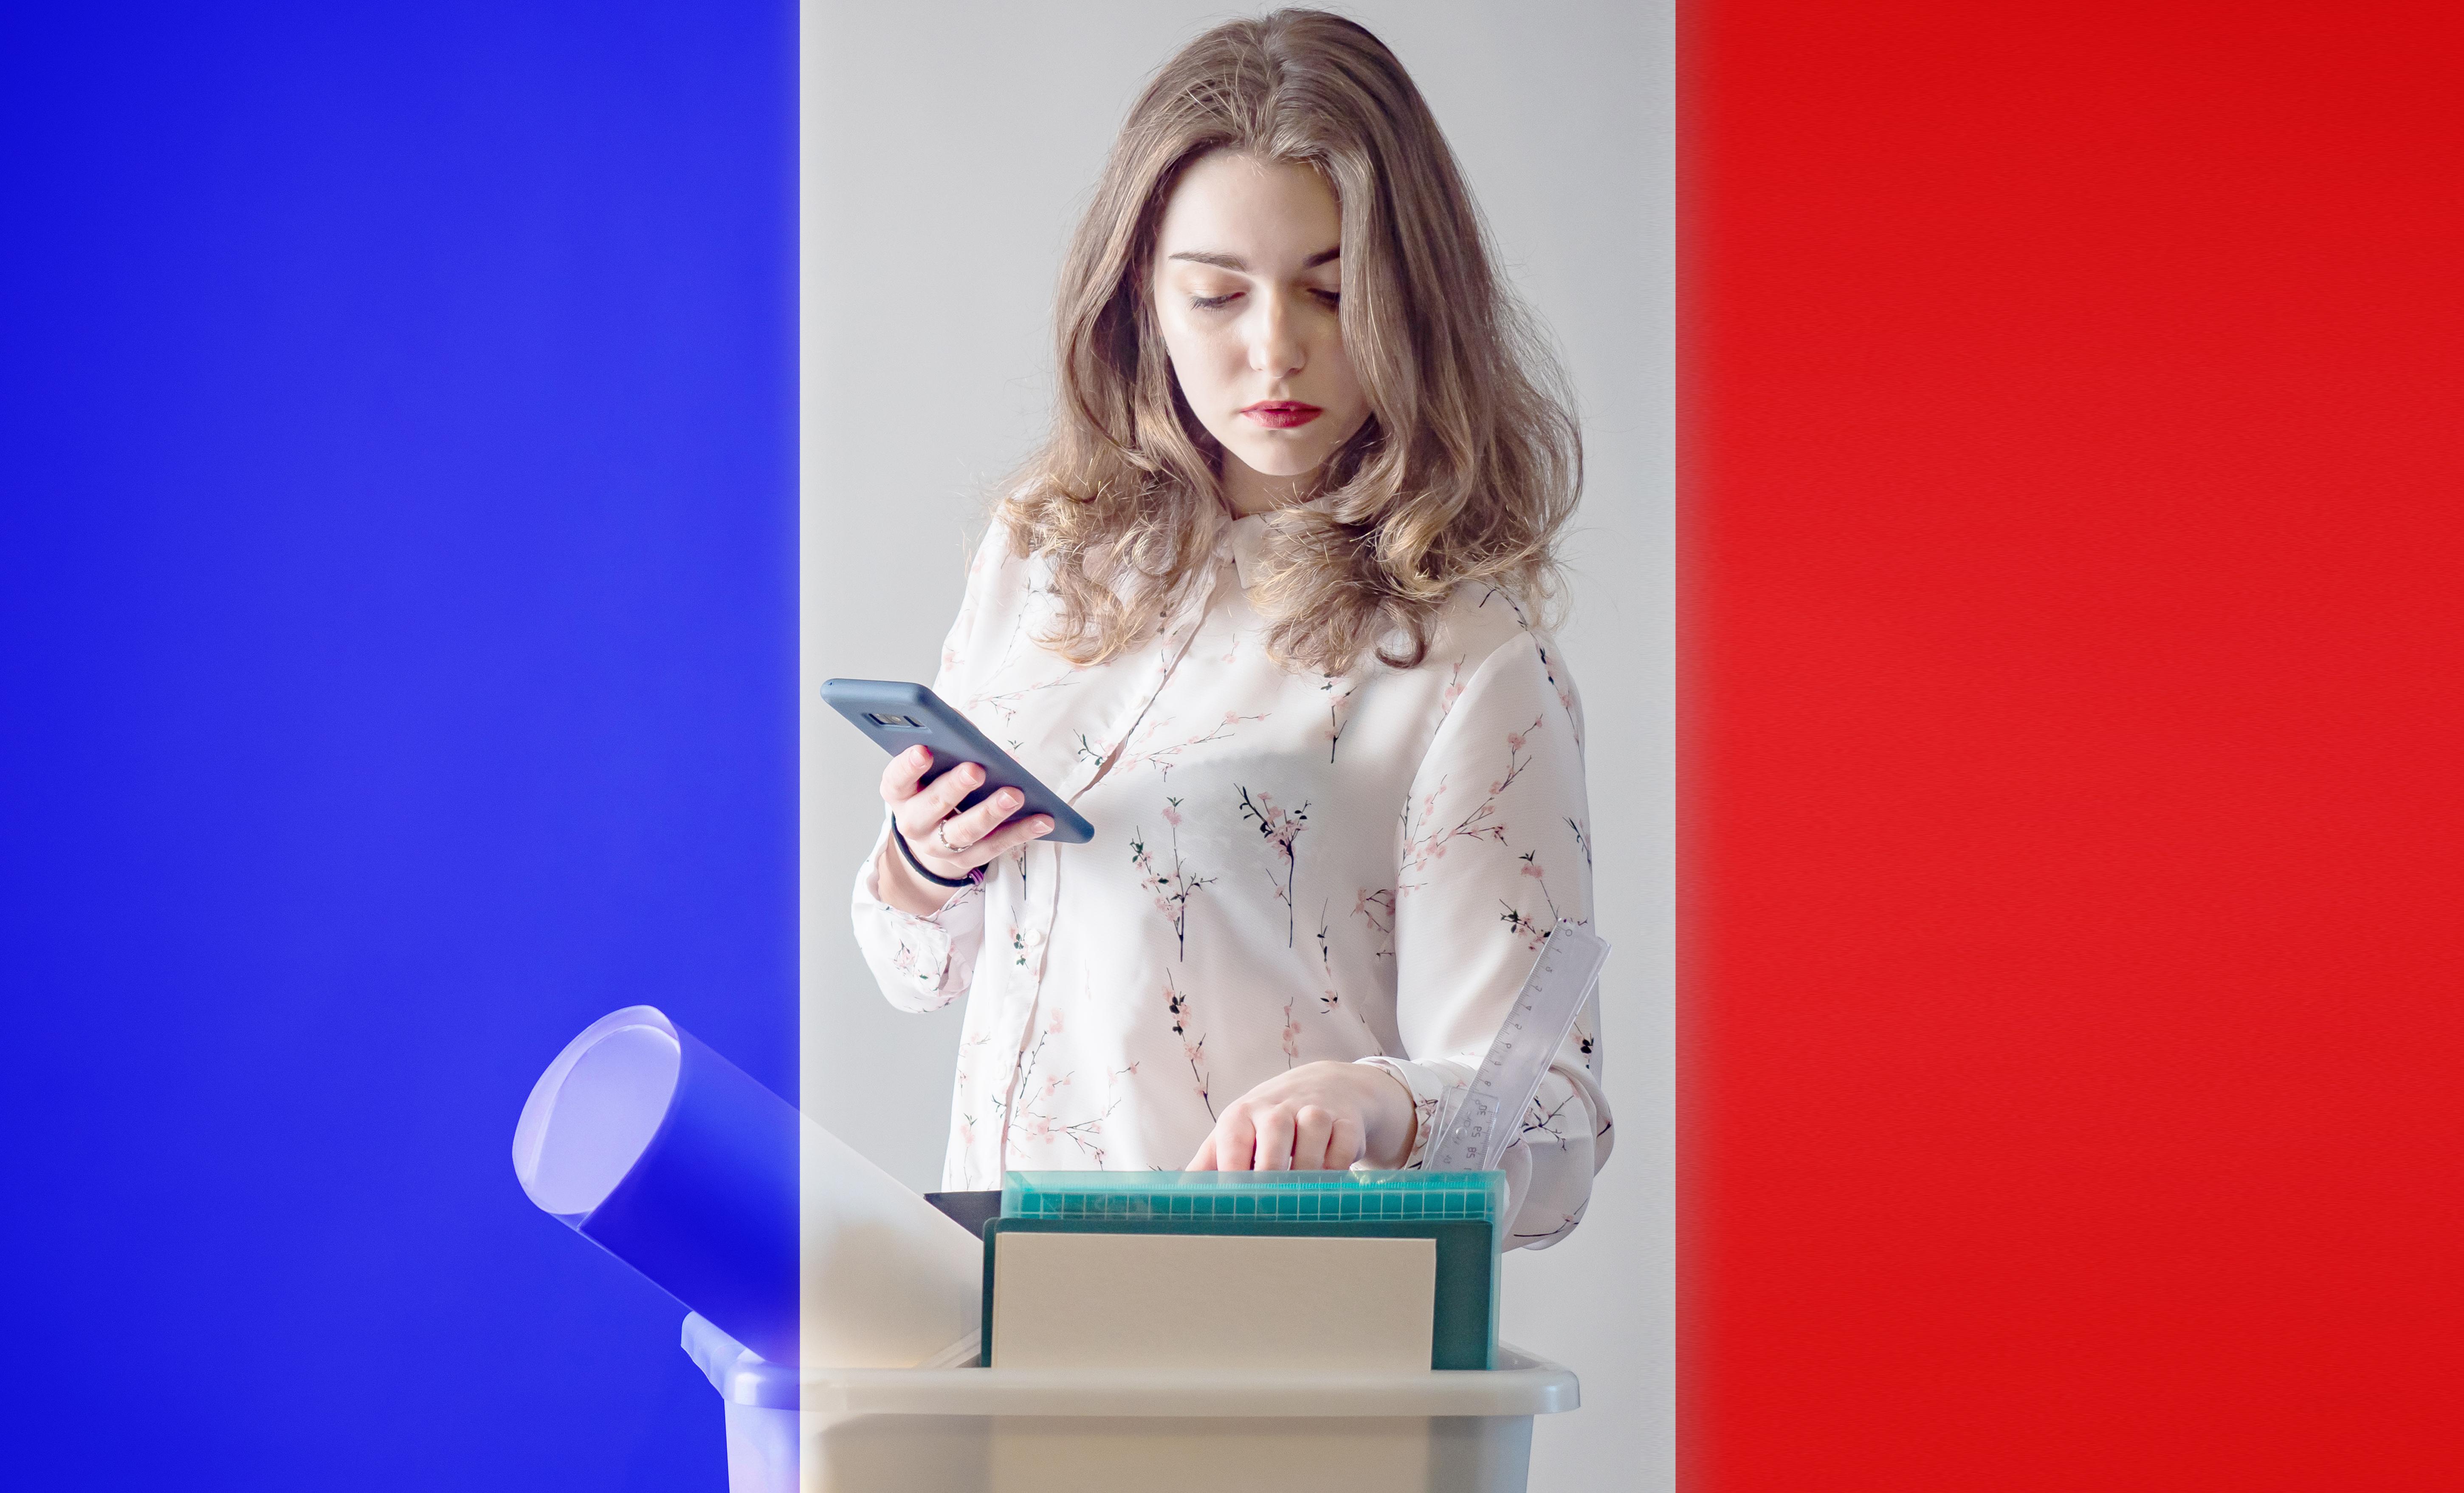 Девушка на фоне флага Франции, где работа доступна для иностранцев